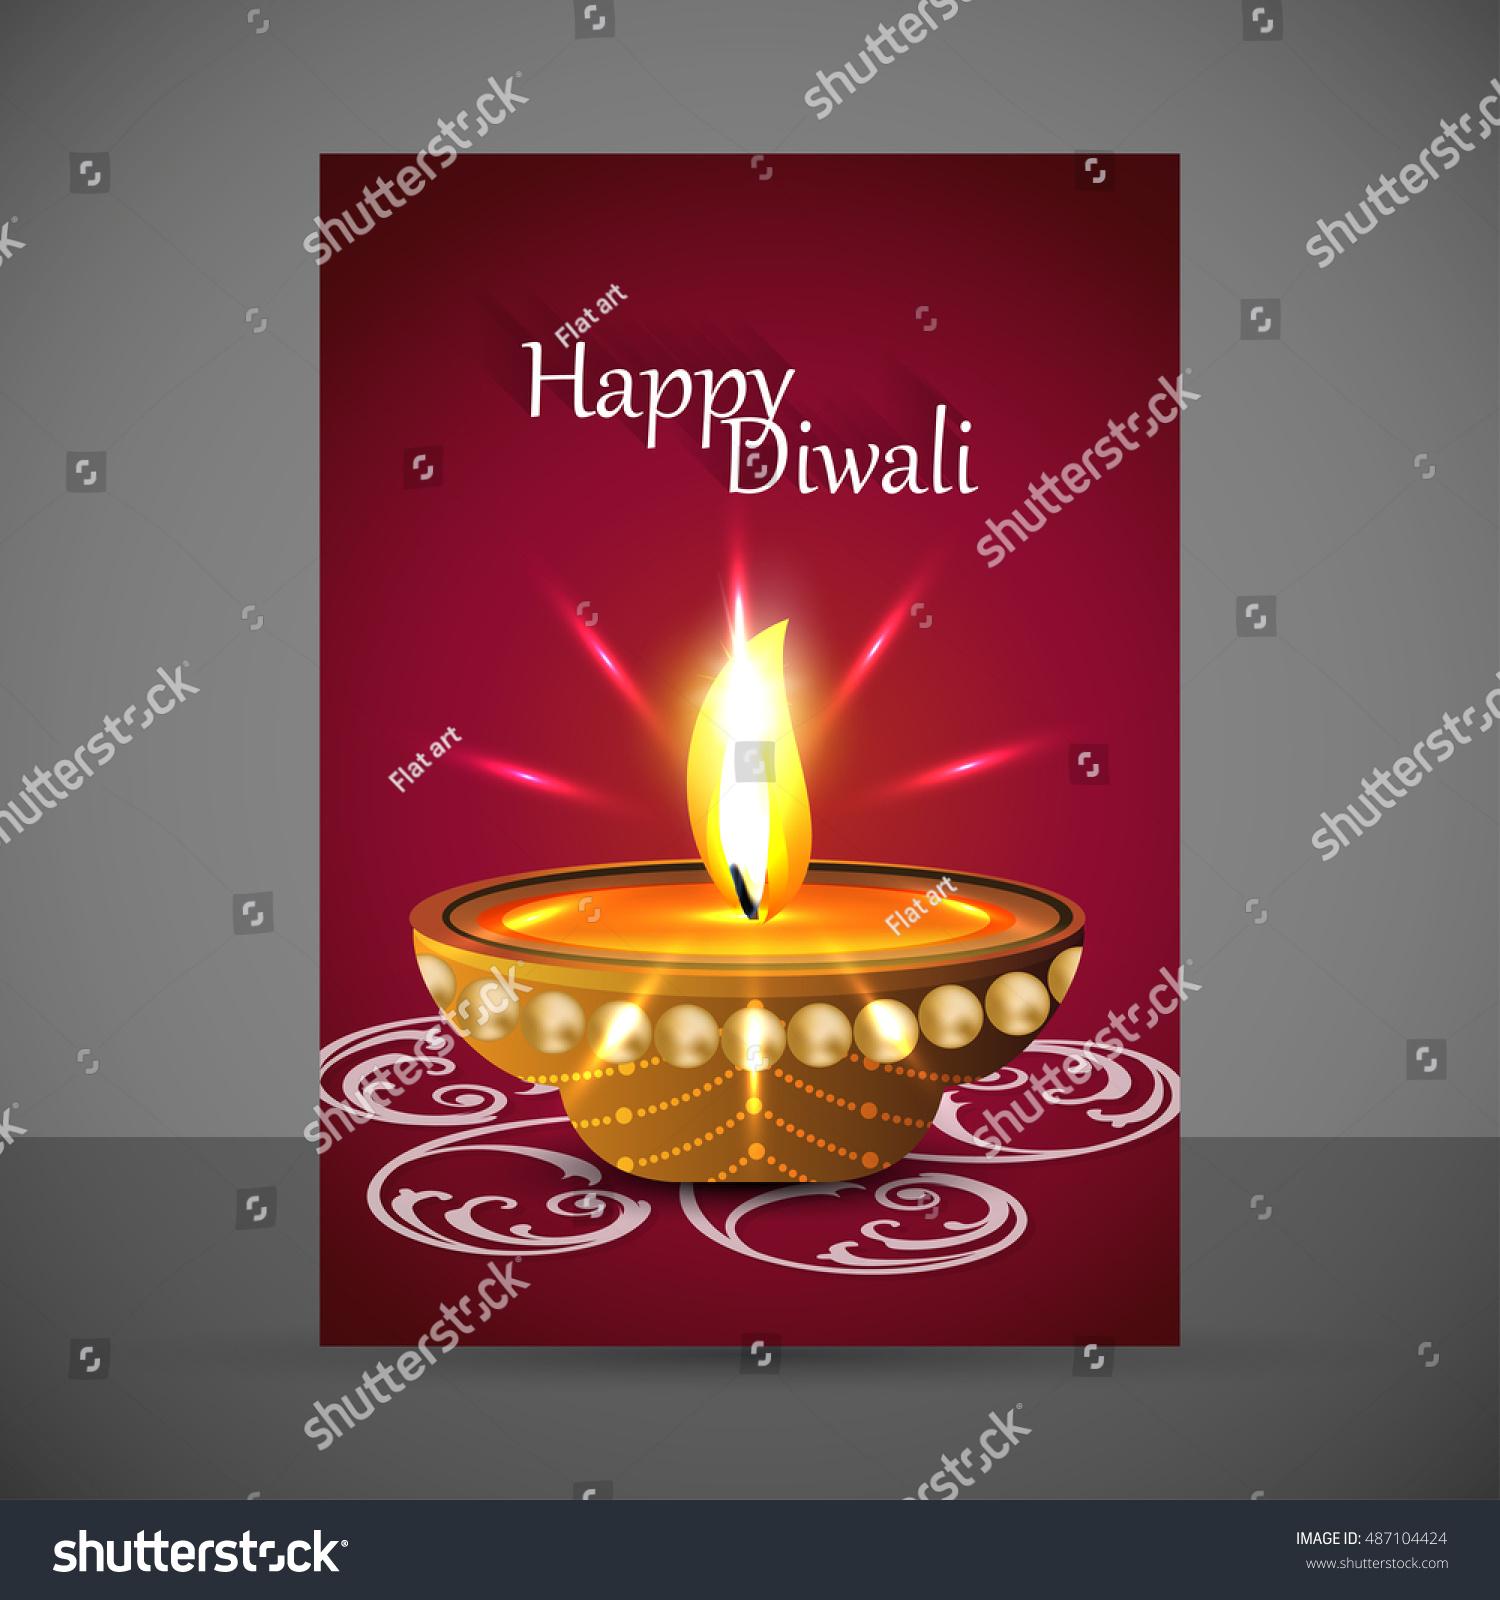 Indian Festival Lights Happy Diwali Greeting Stock Photo Photo